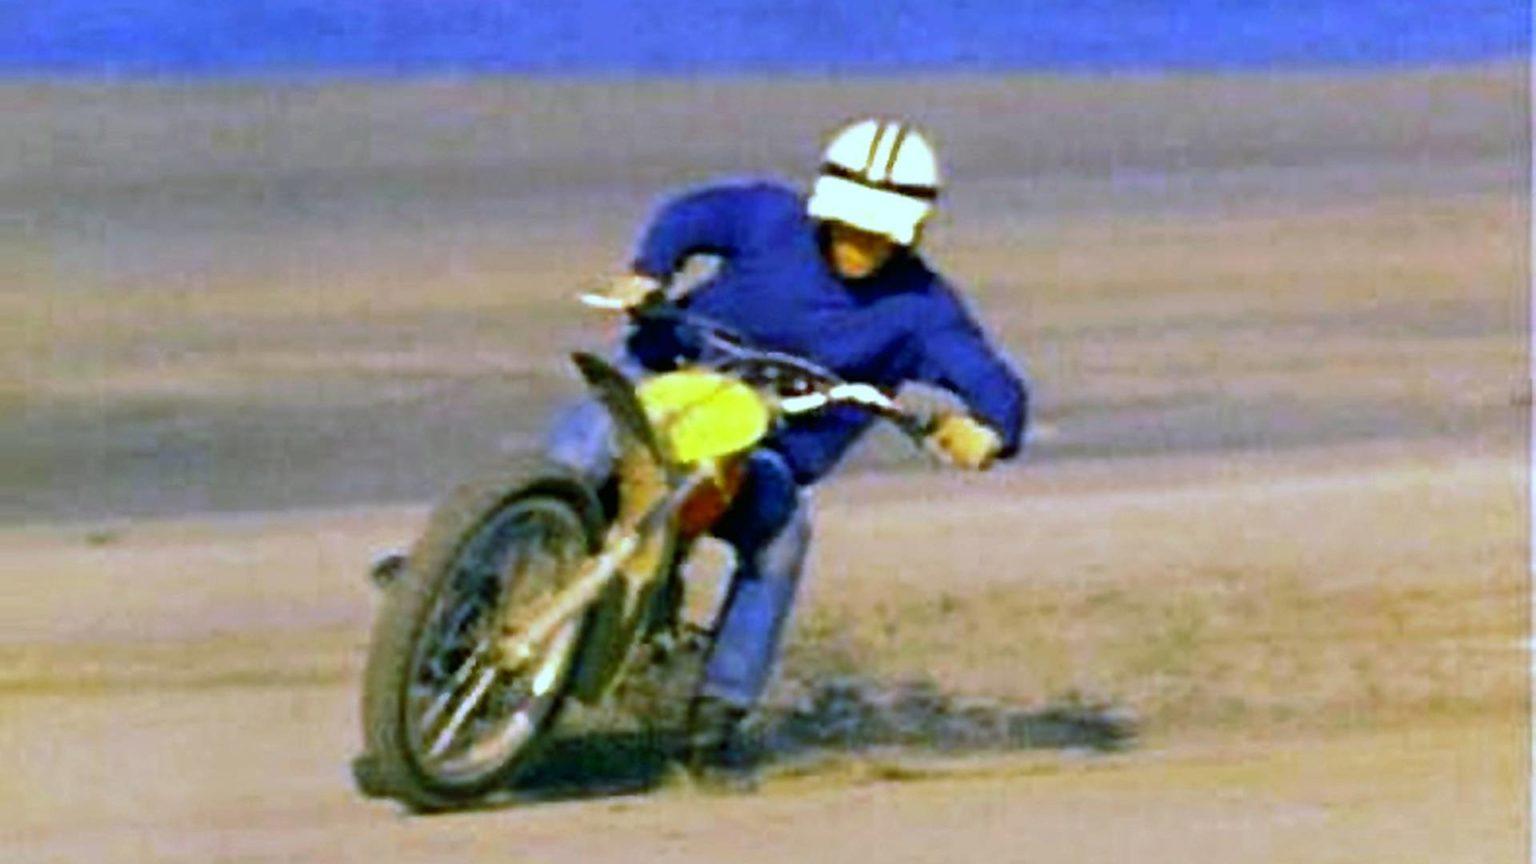 [Imagem: on-any-sunday-1971-moto-movie-review-8-1536x864.jpg]